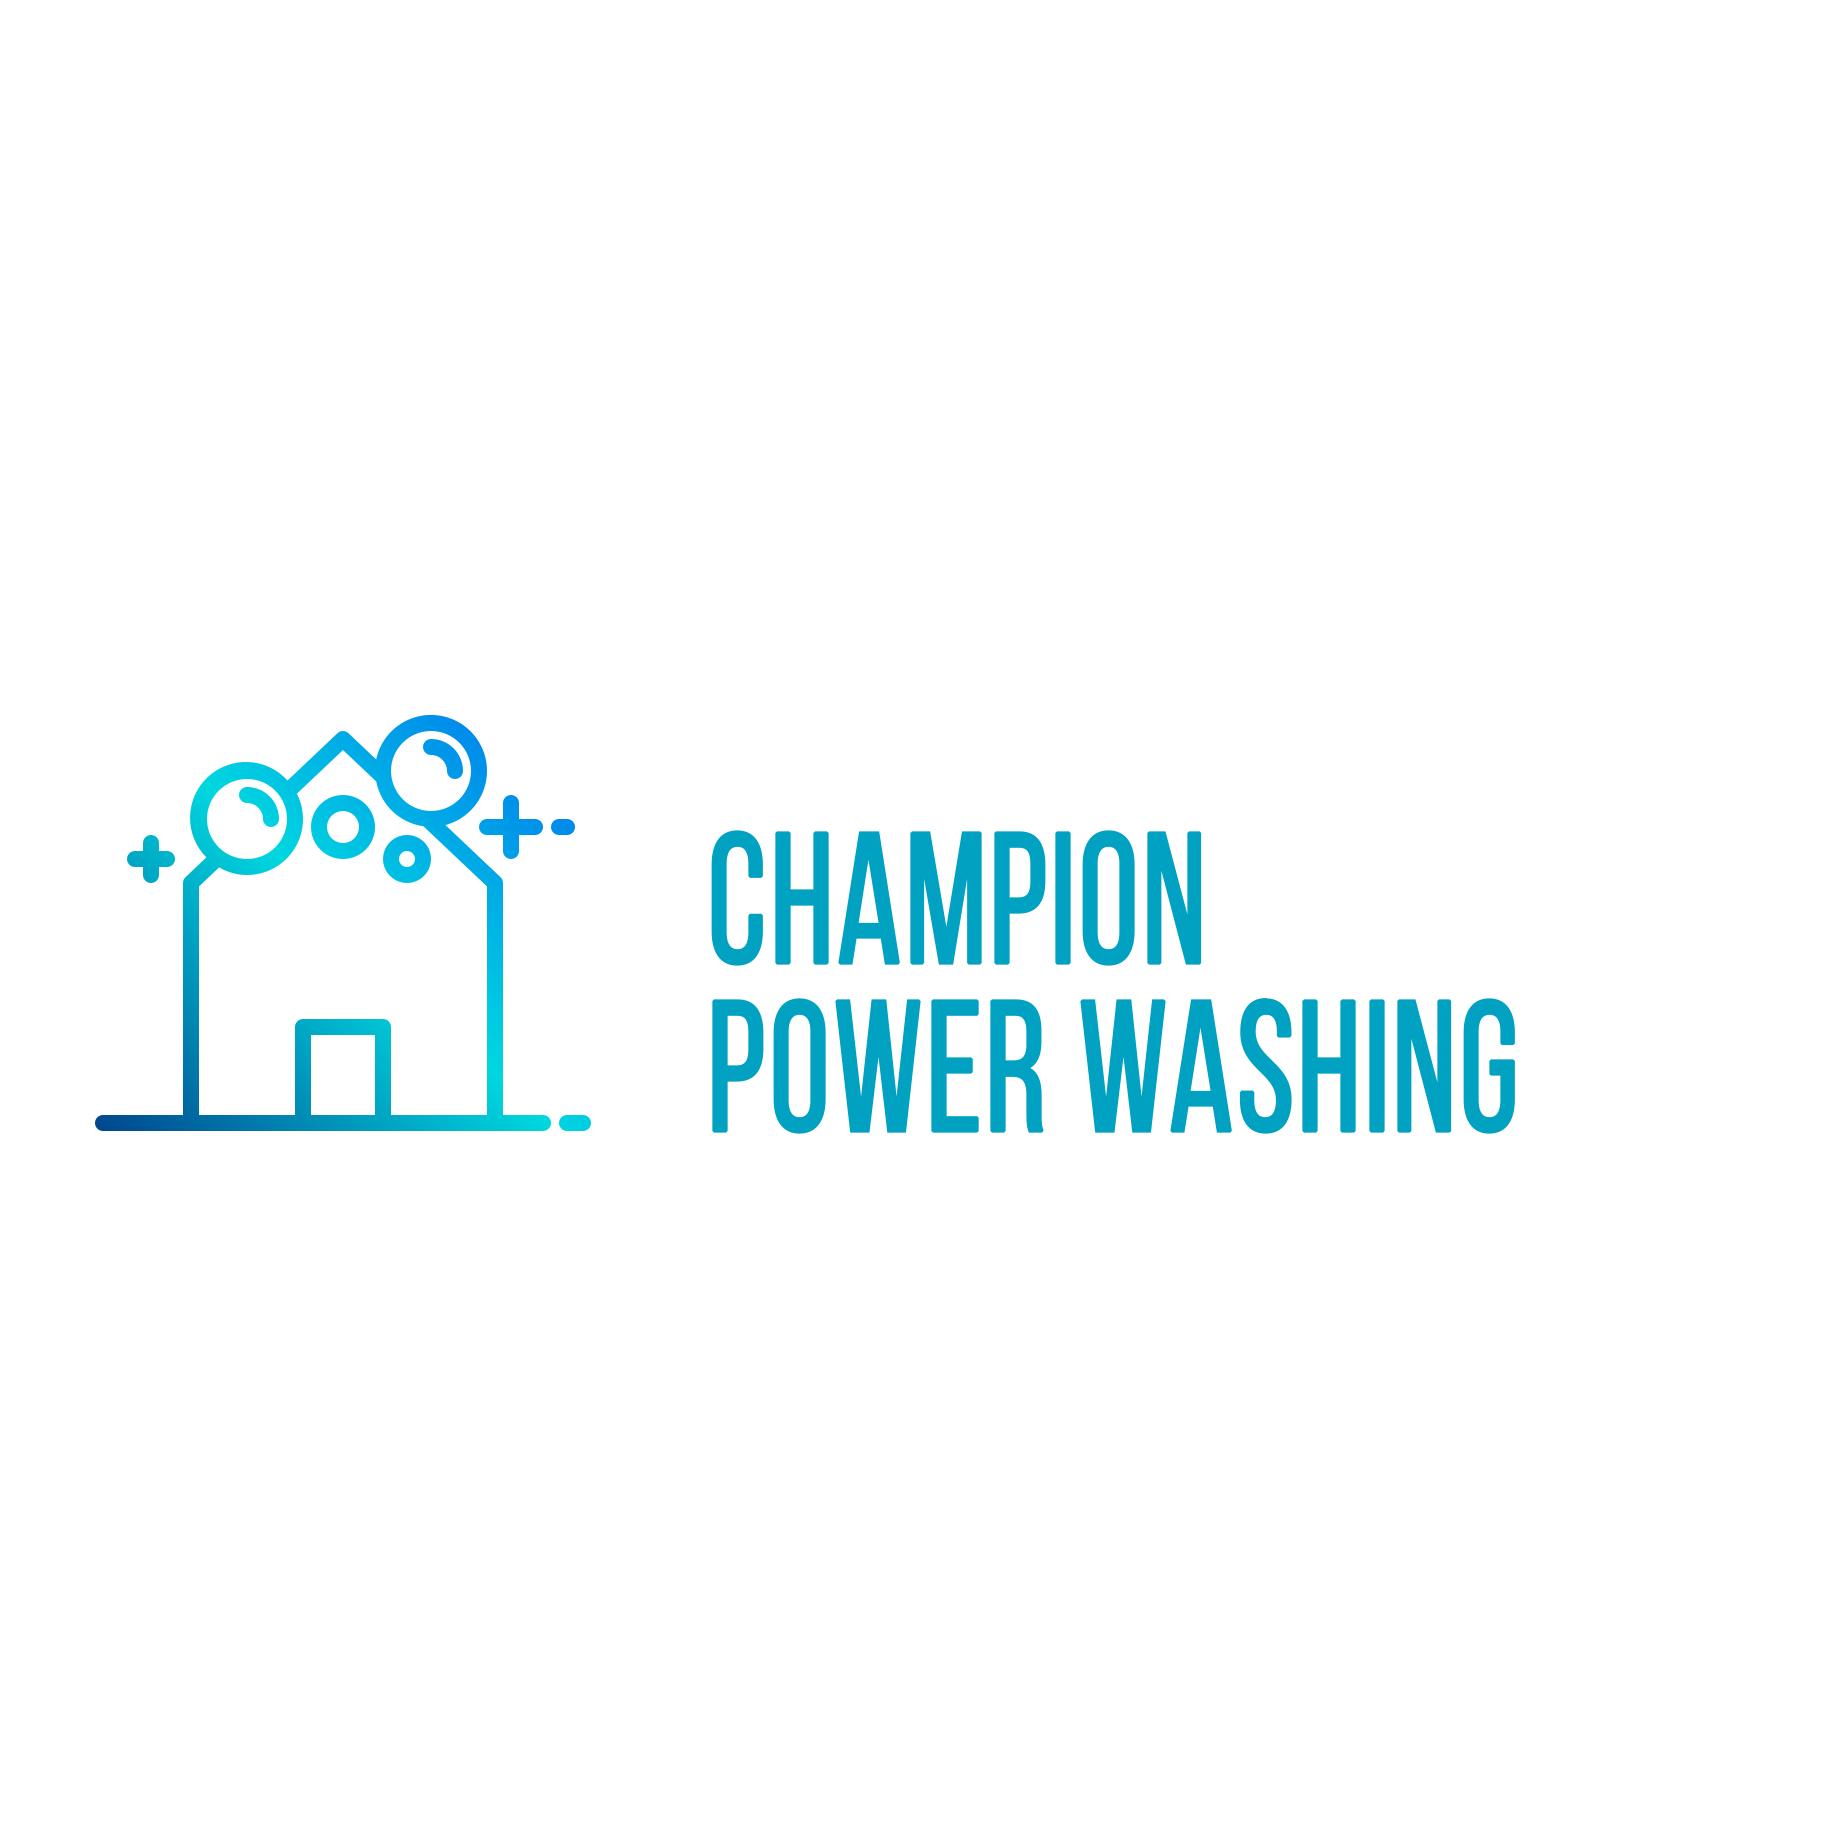 Champion Power Washing